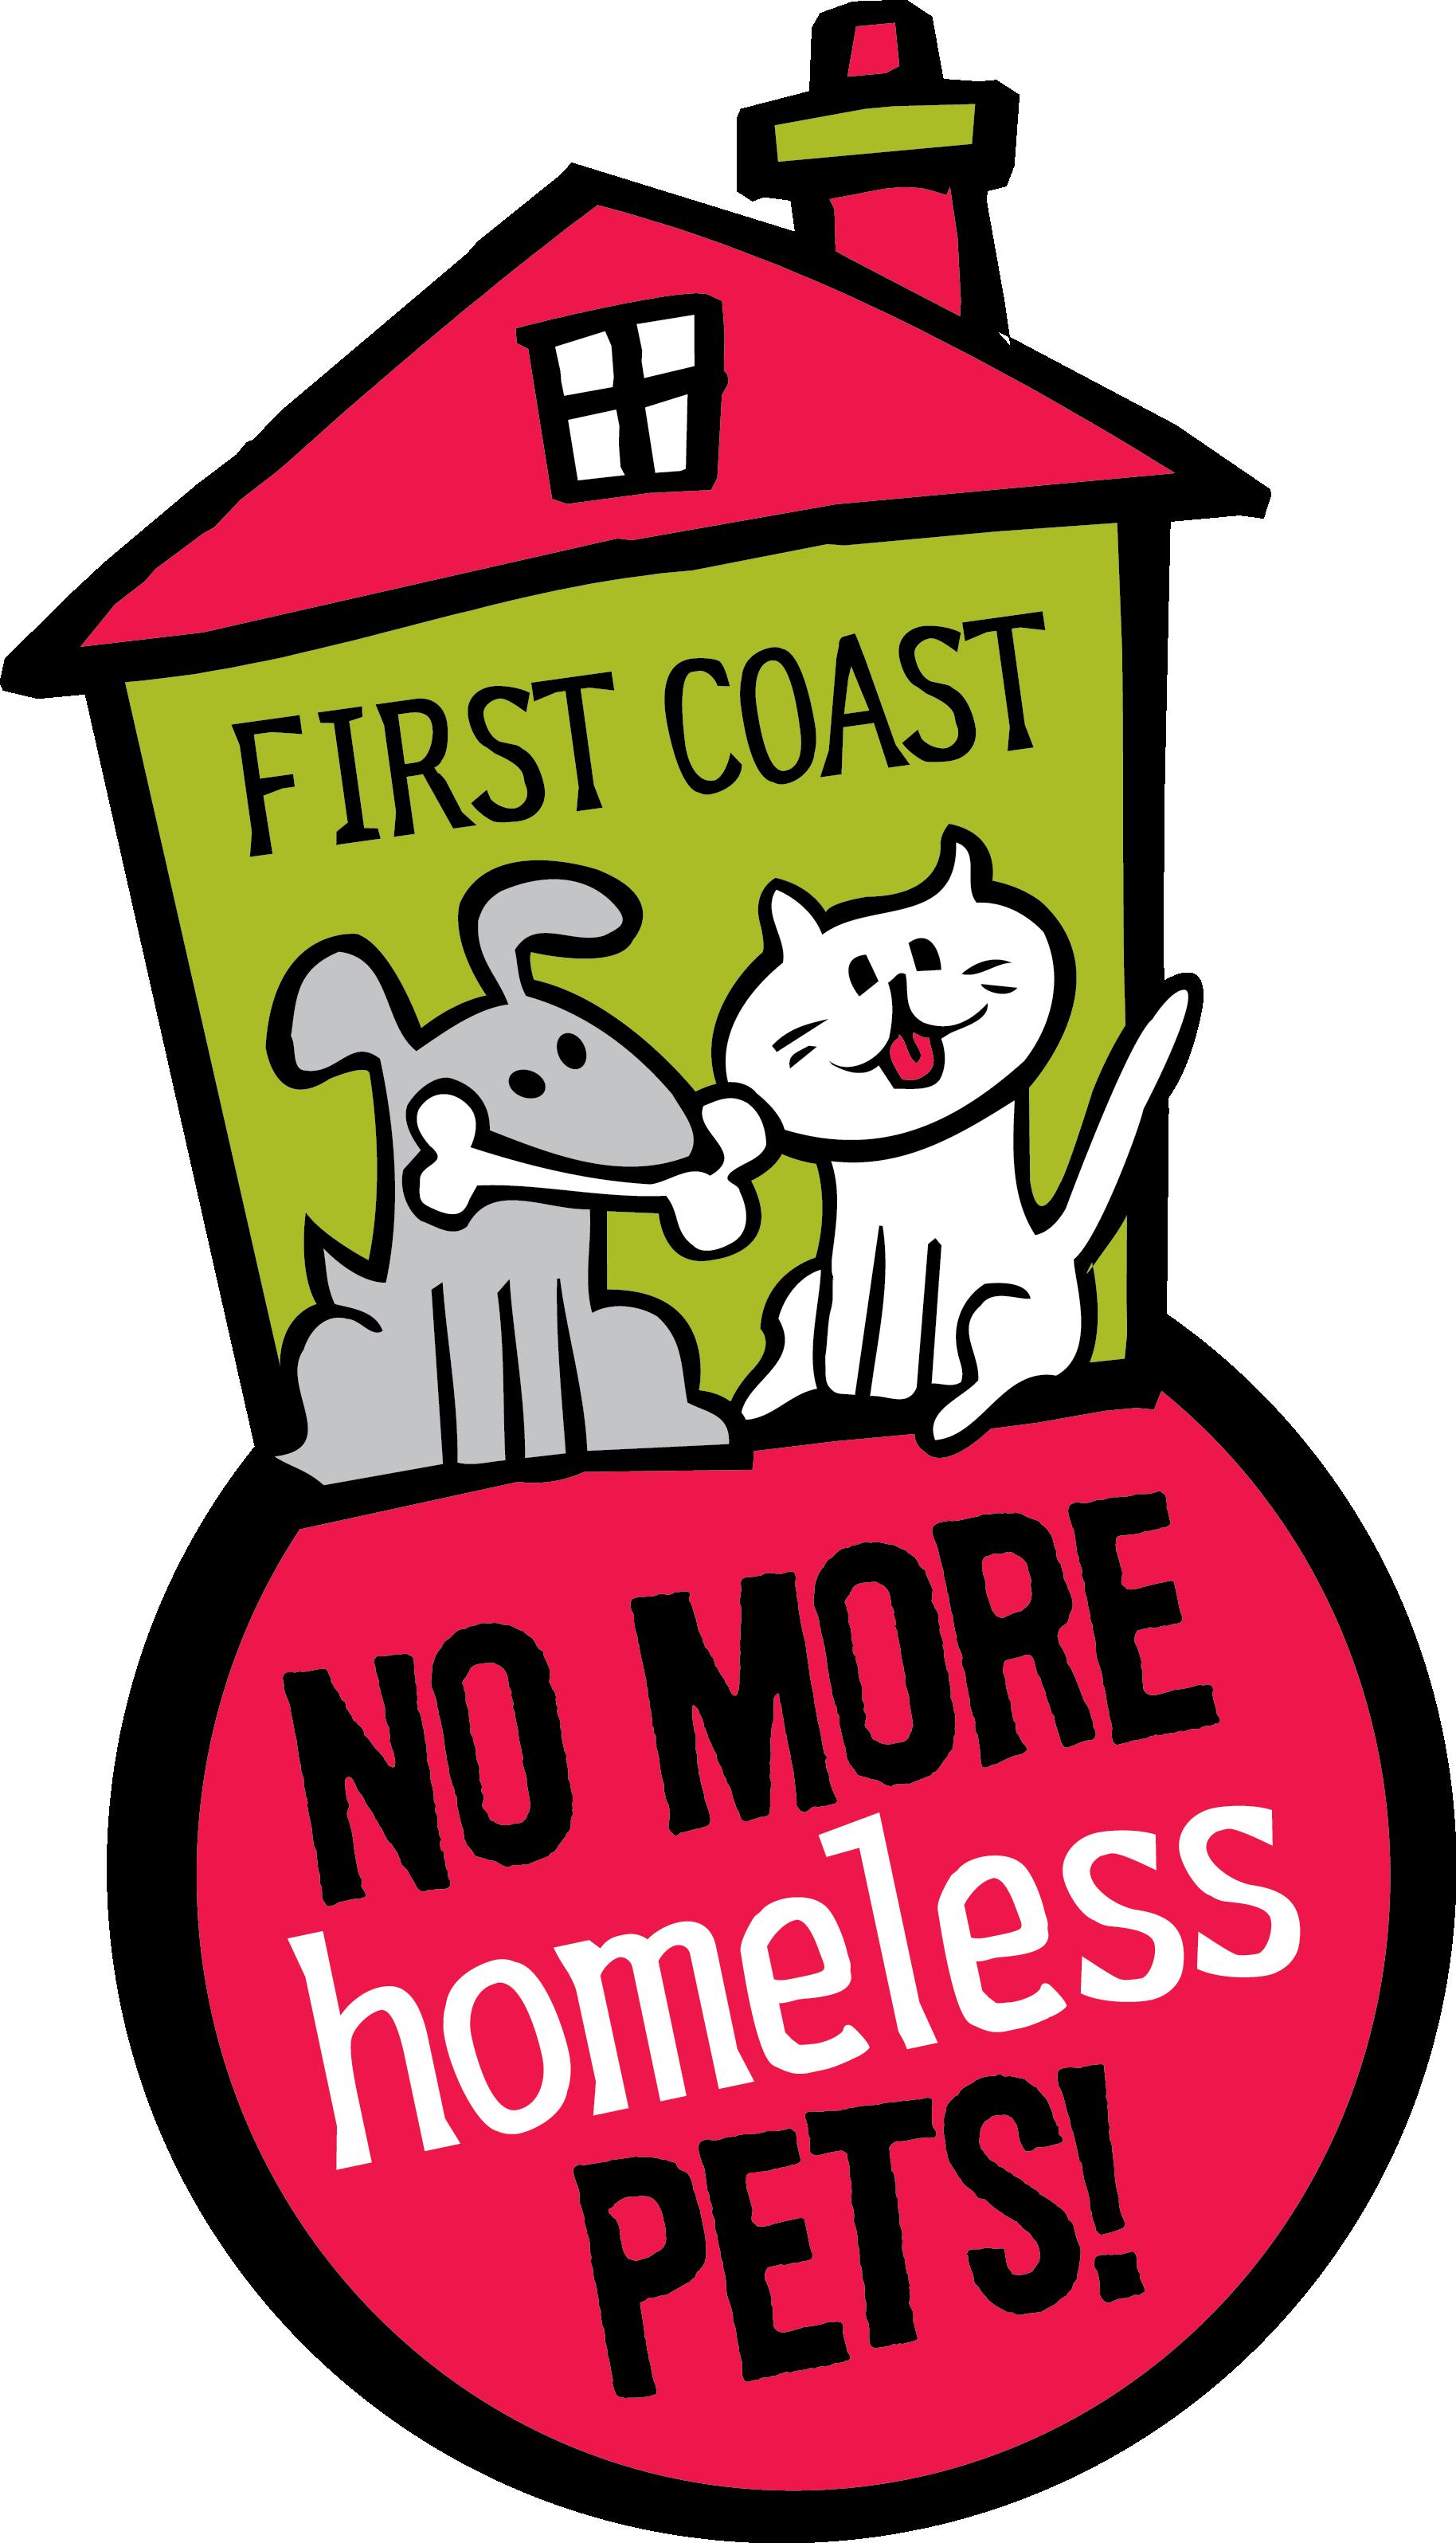 Photos Photos And More Photos >> First Coast No More Homeless Pets